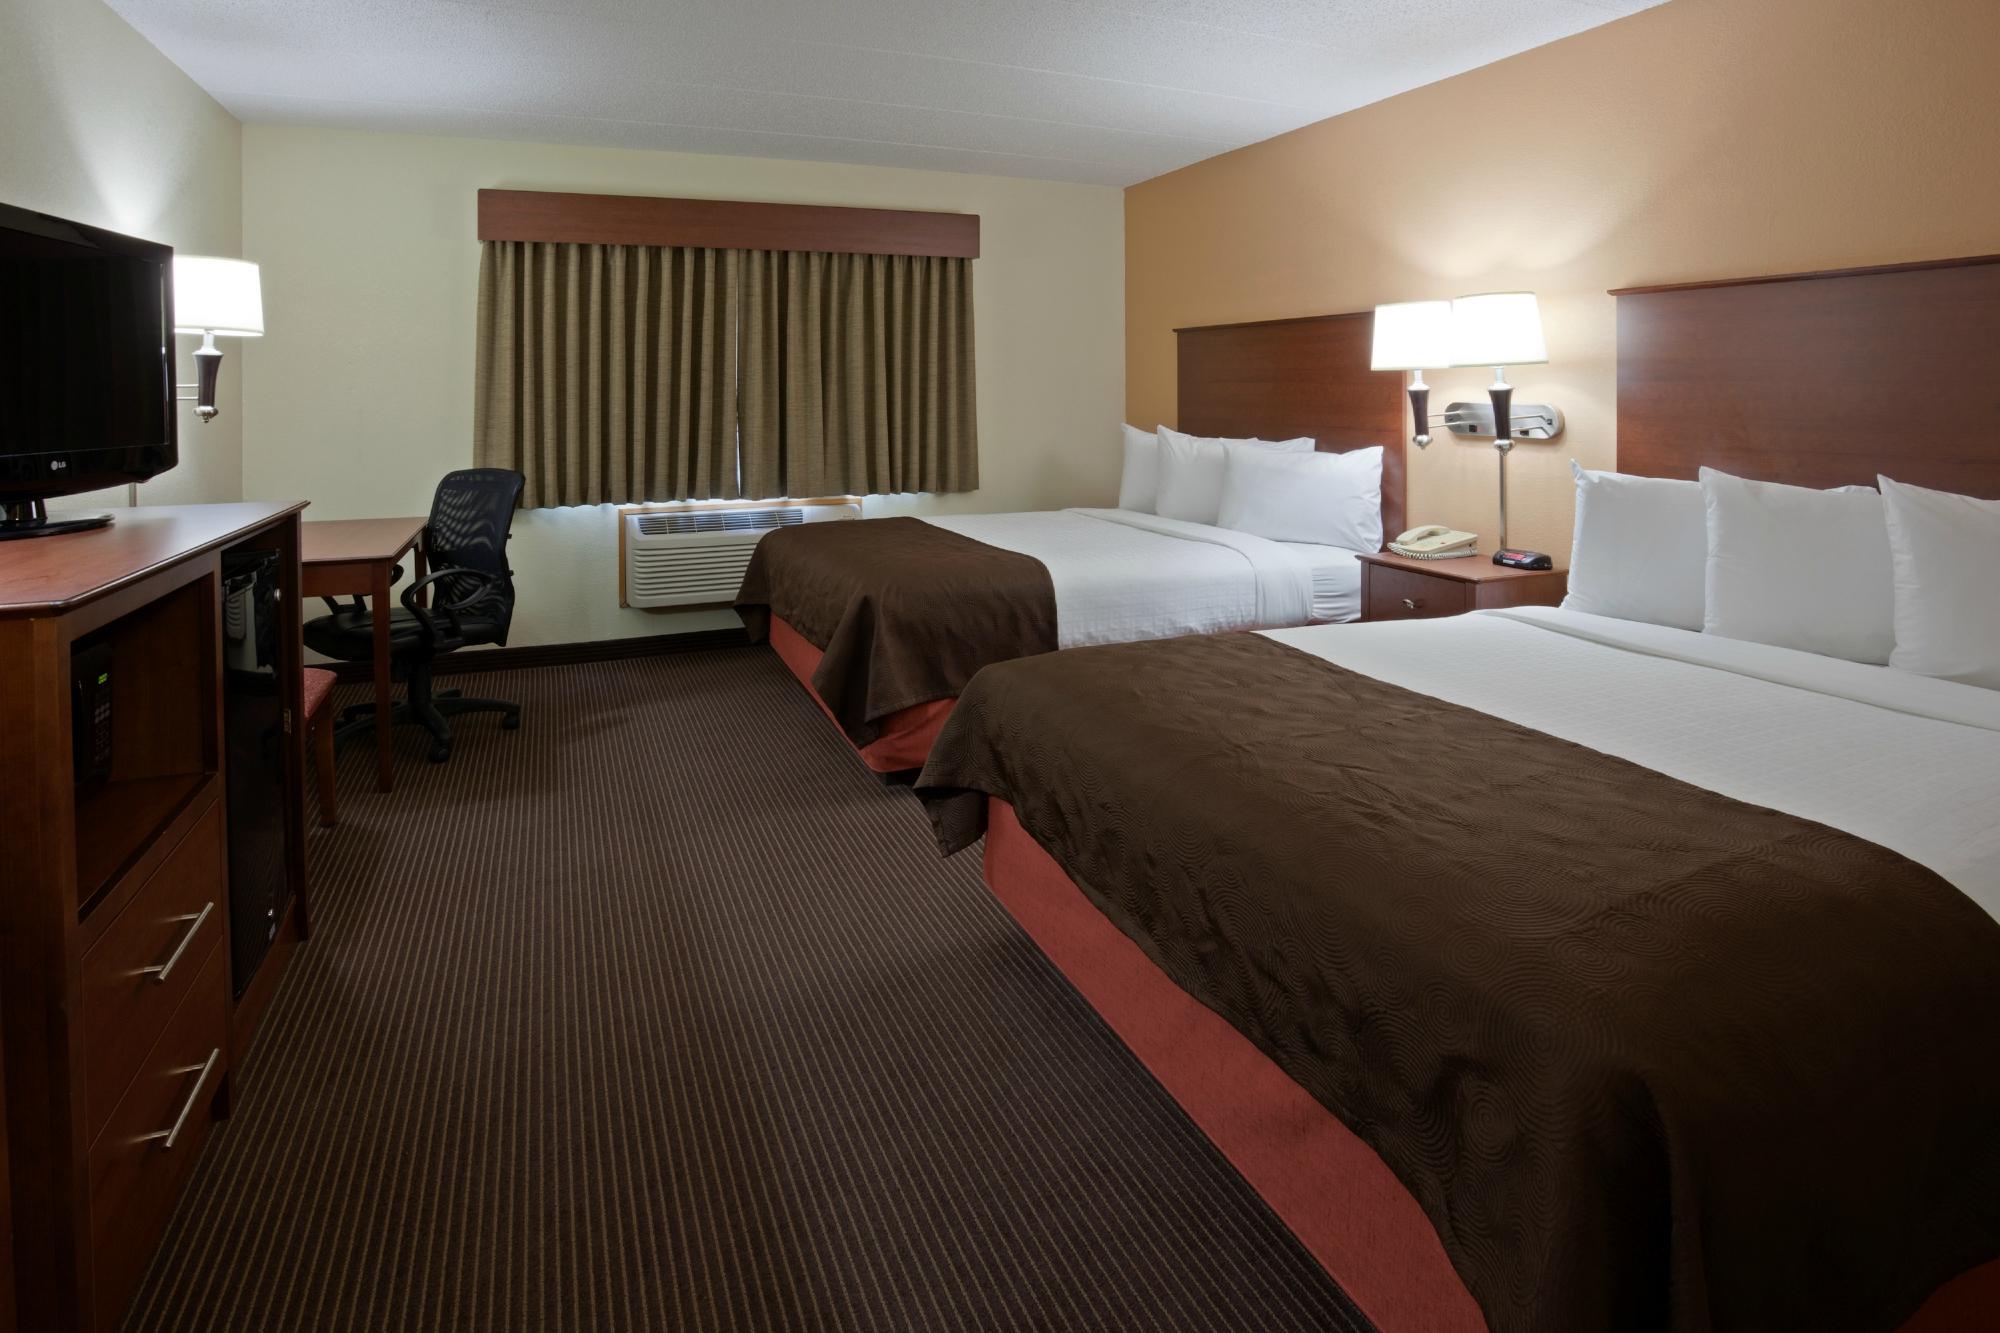 AmericInn Lodge & Suites Bismarck